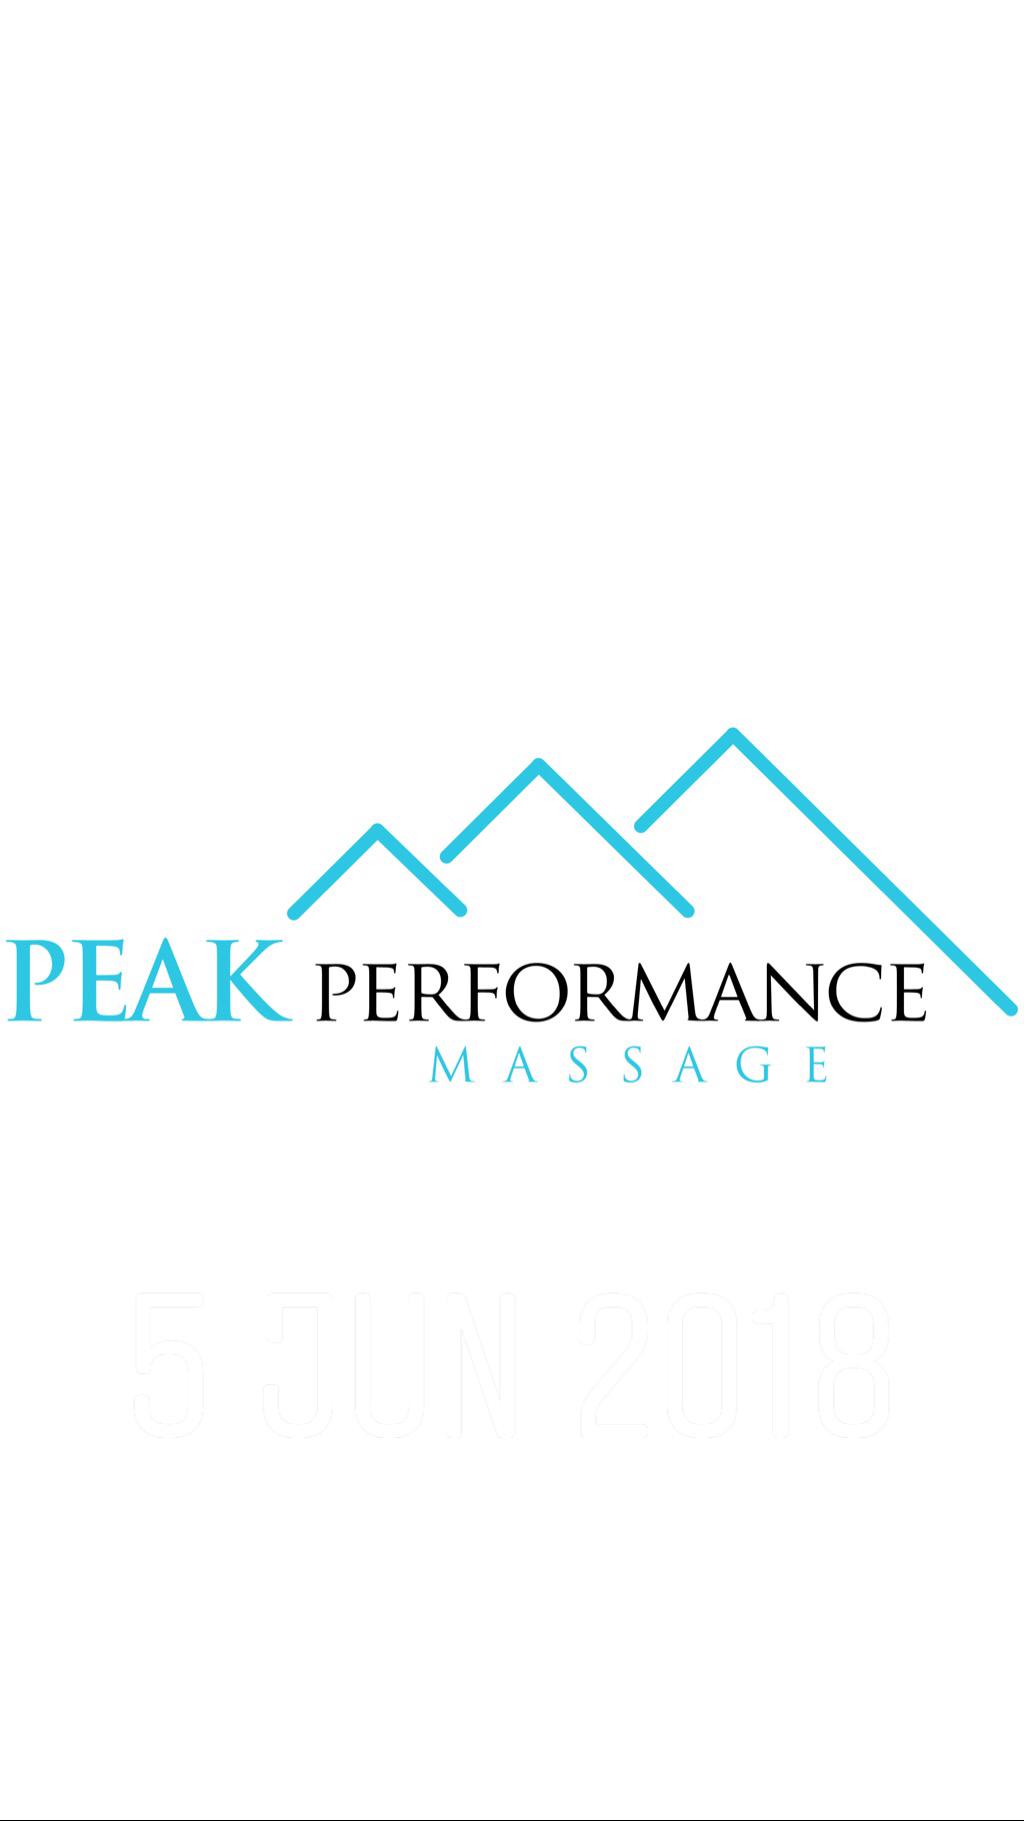 Peak Performance Massage Verified Logo